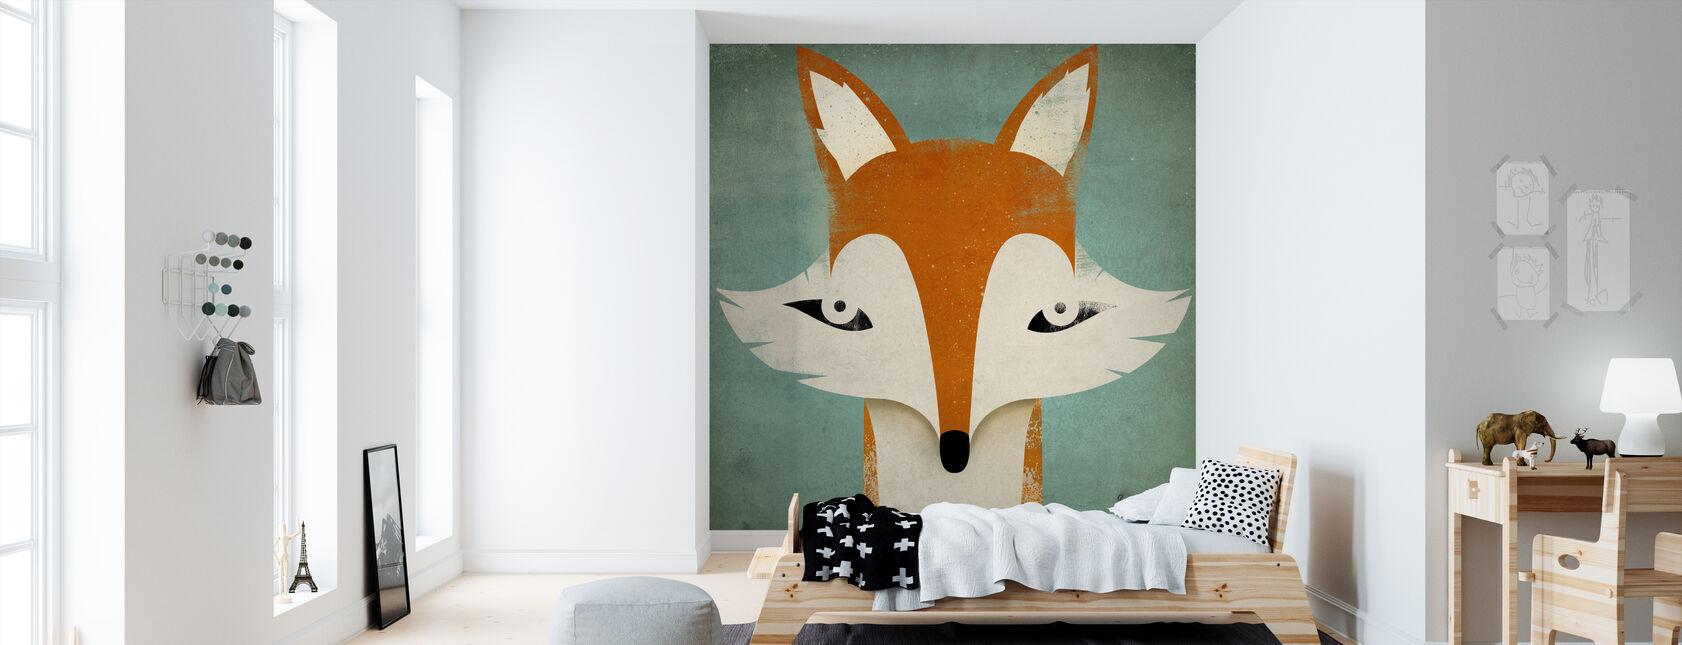 Fox - Wallpaper - Kids Room